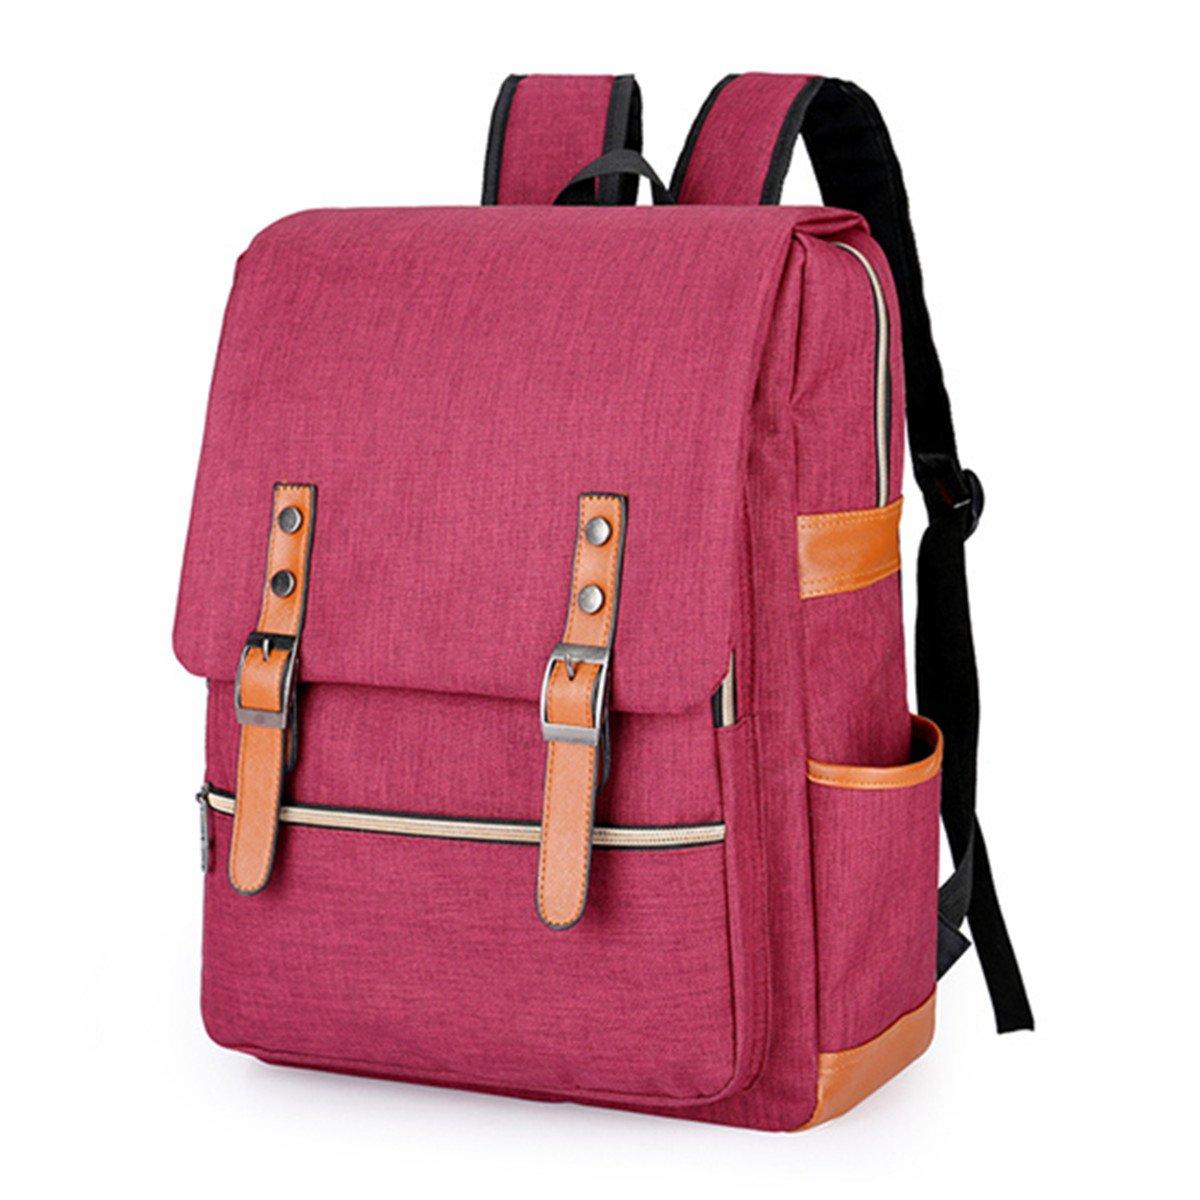 Amazon.com: Vintage Men Women Canvas Backpacks For Teenage Girls School Bags Large Laptop Backpack Mochilas Fashion Men Backpack Purple 15Inch 30X40X12Cm: ...